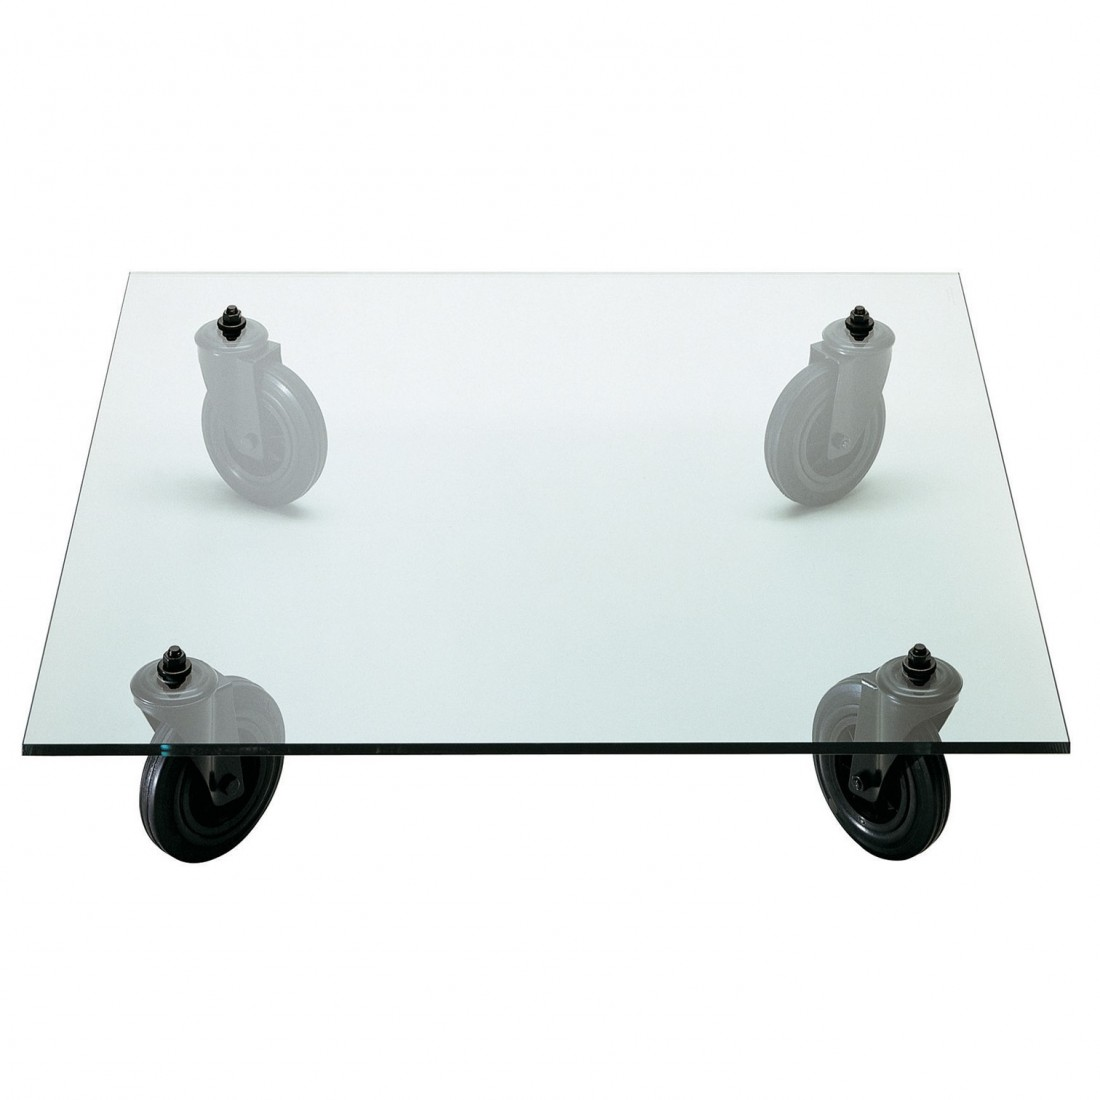 Table Con ruote - FONTANA ARTE